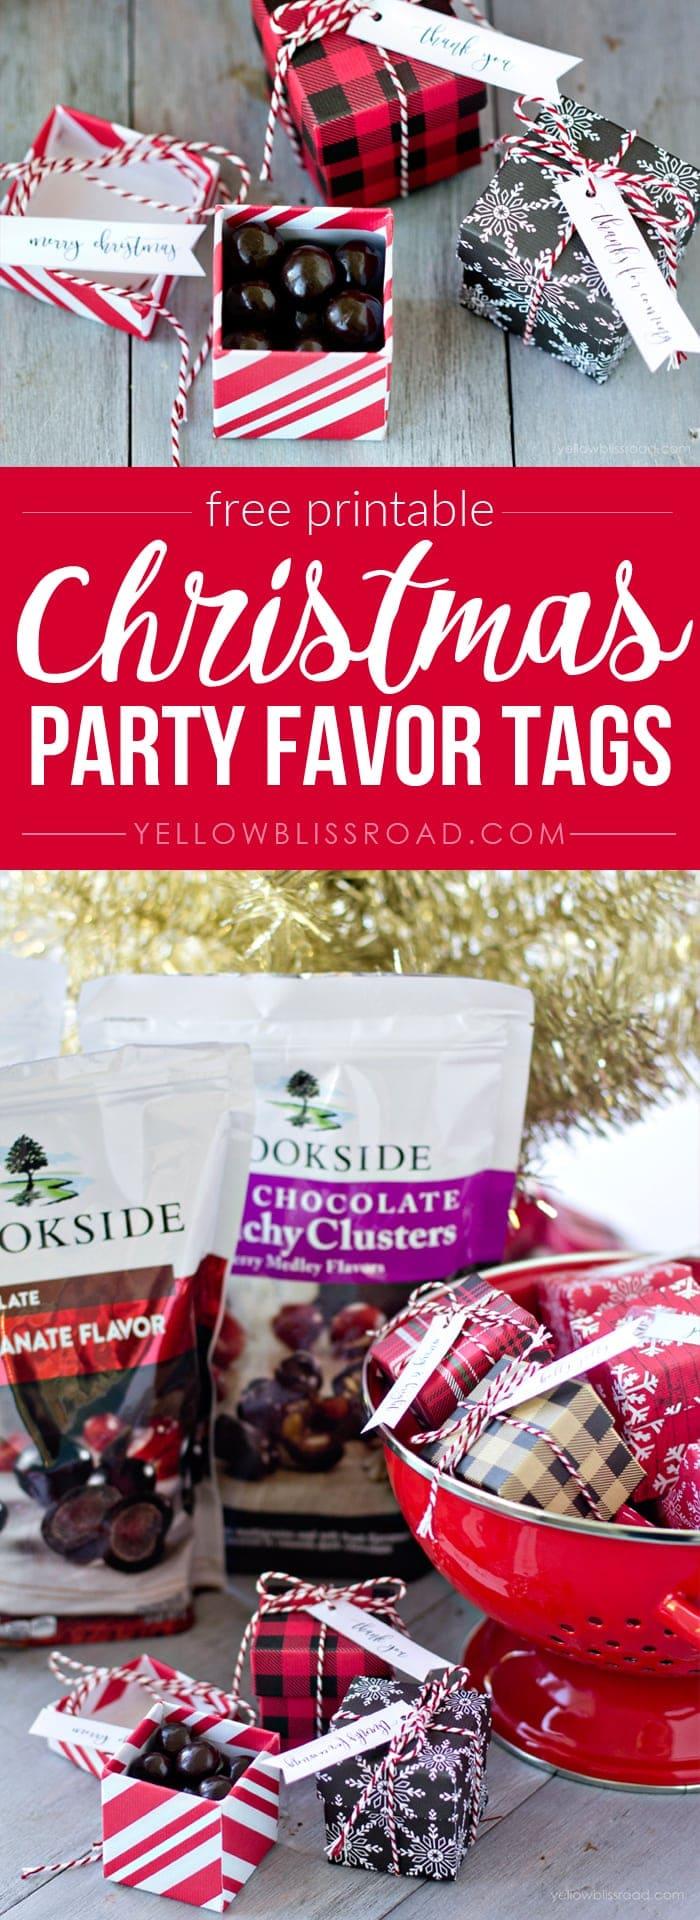 Free printable Christmas Party Favor tags